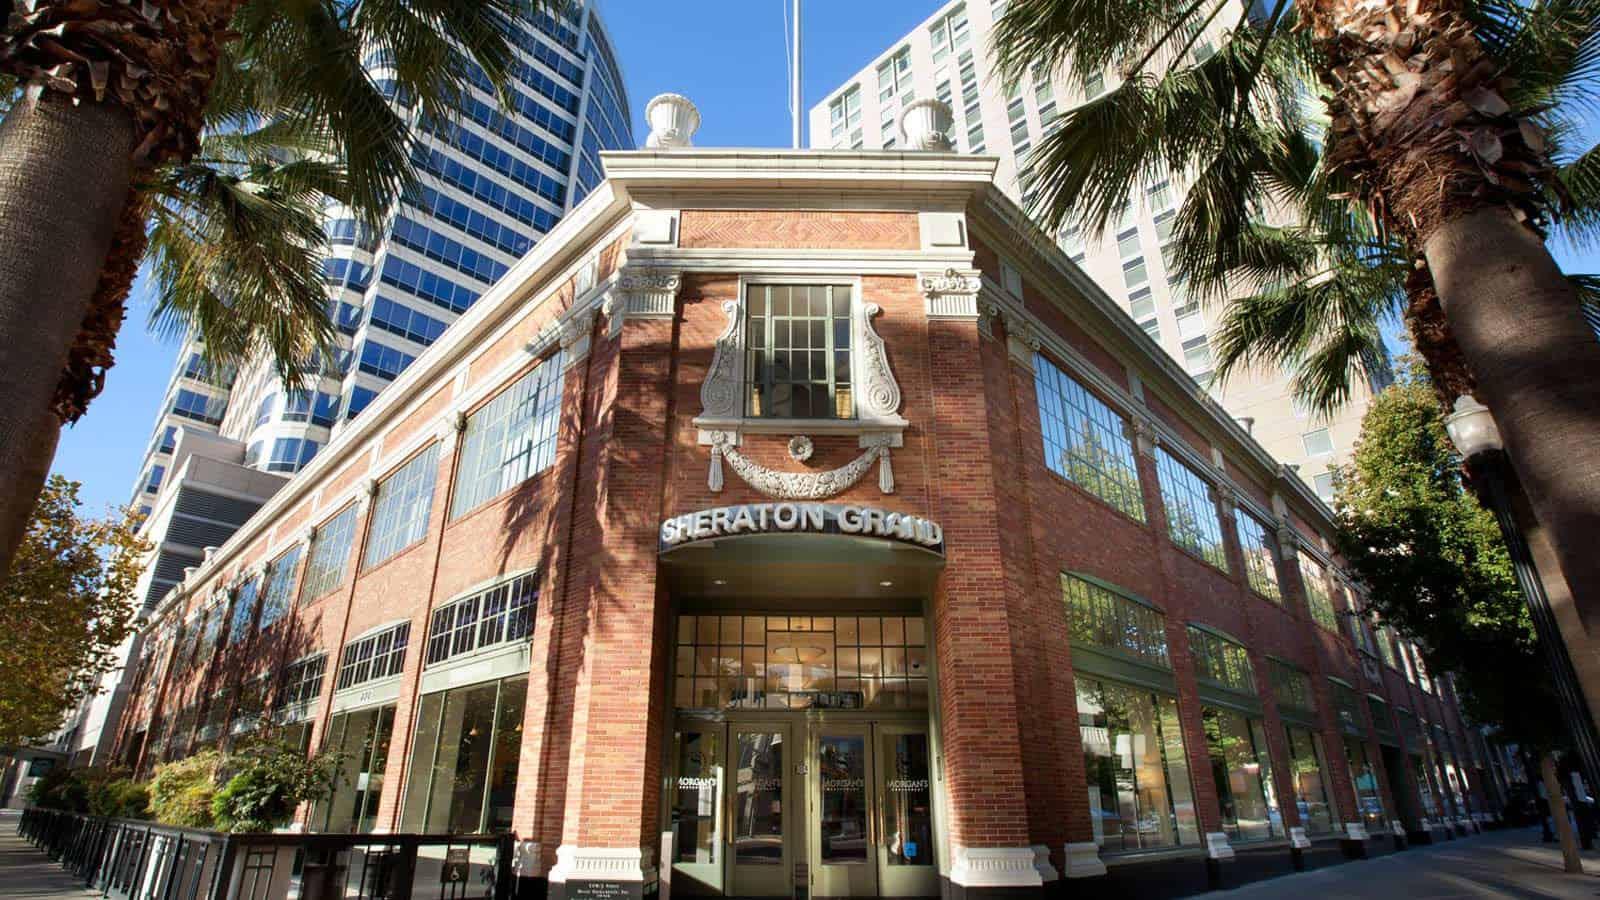 Sheraton Grand Hotel Sacramento